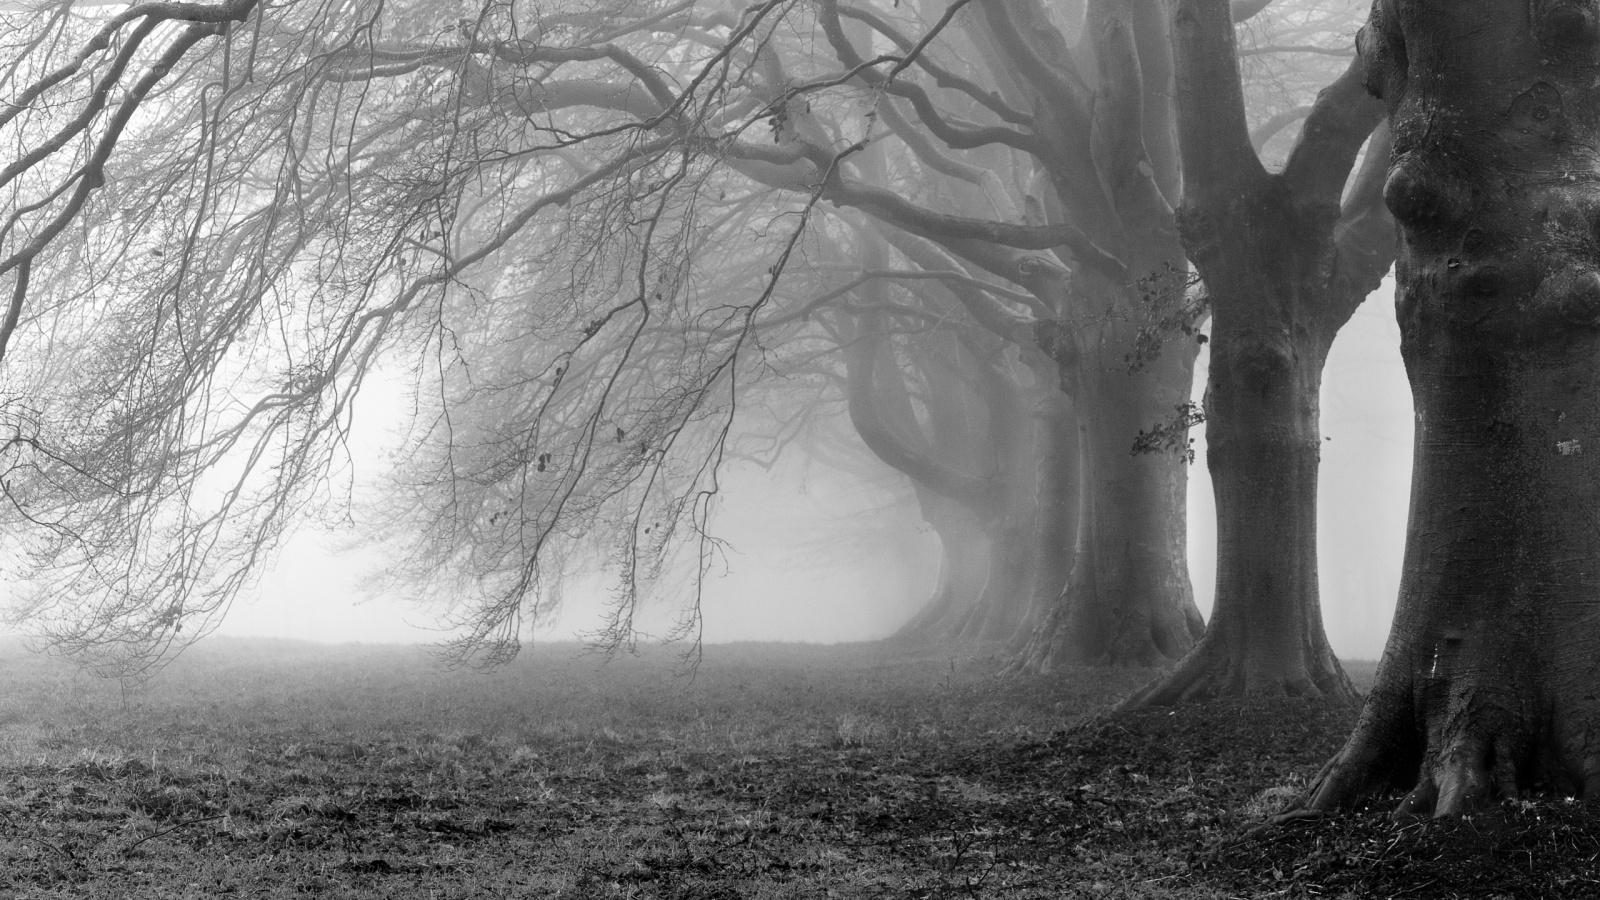 mist wallpaper tree download